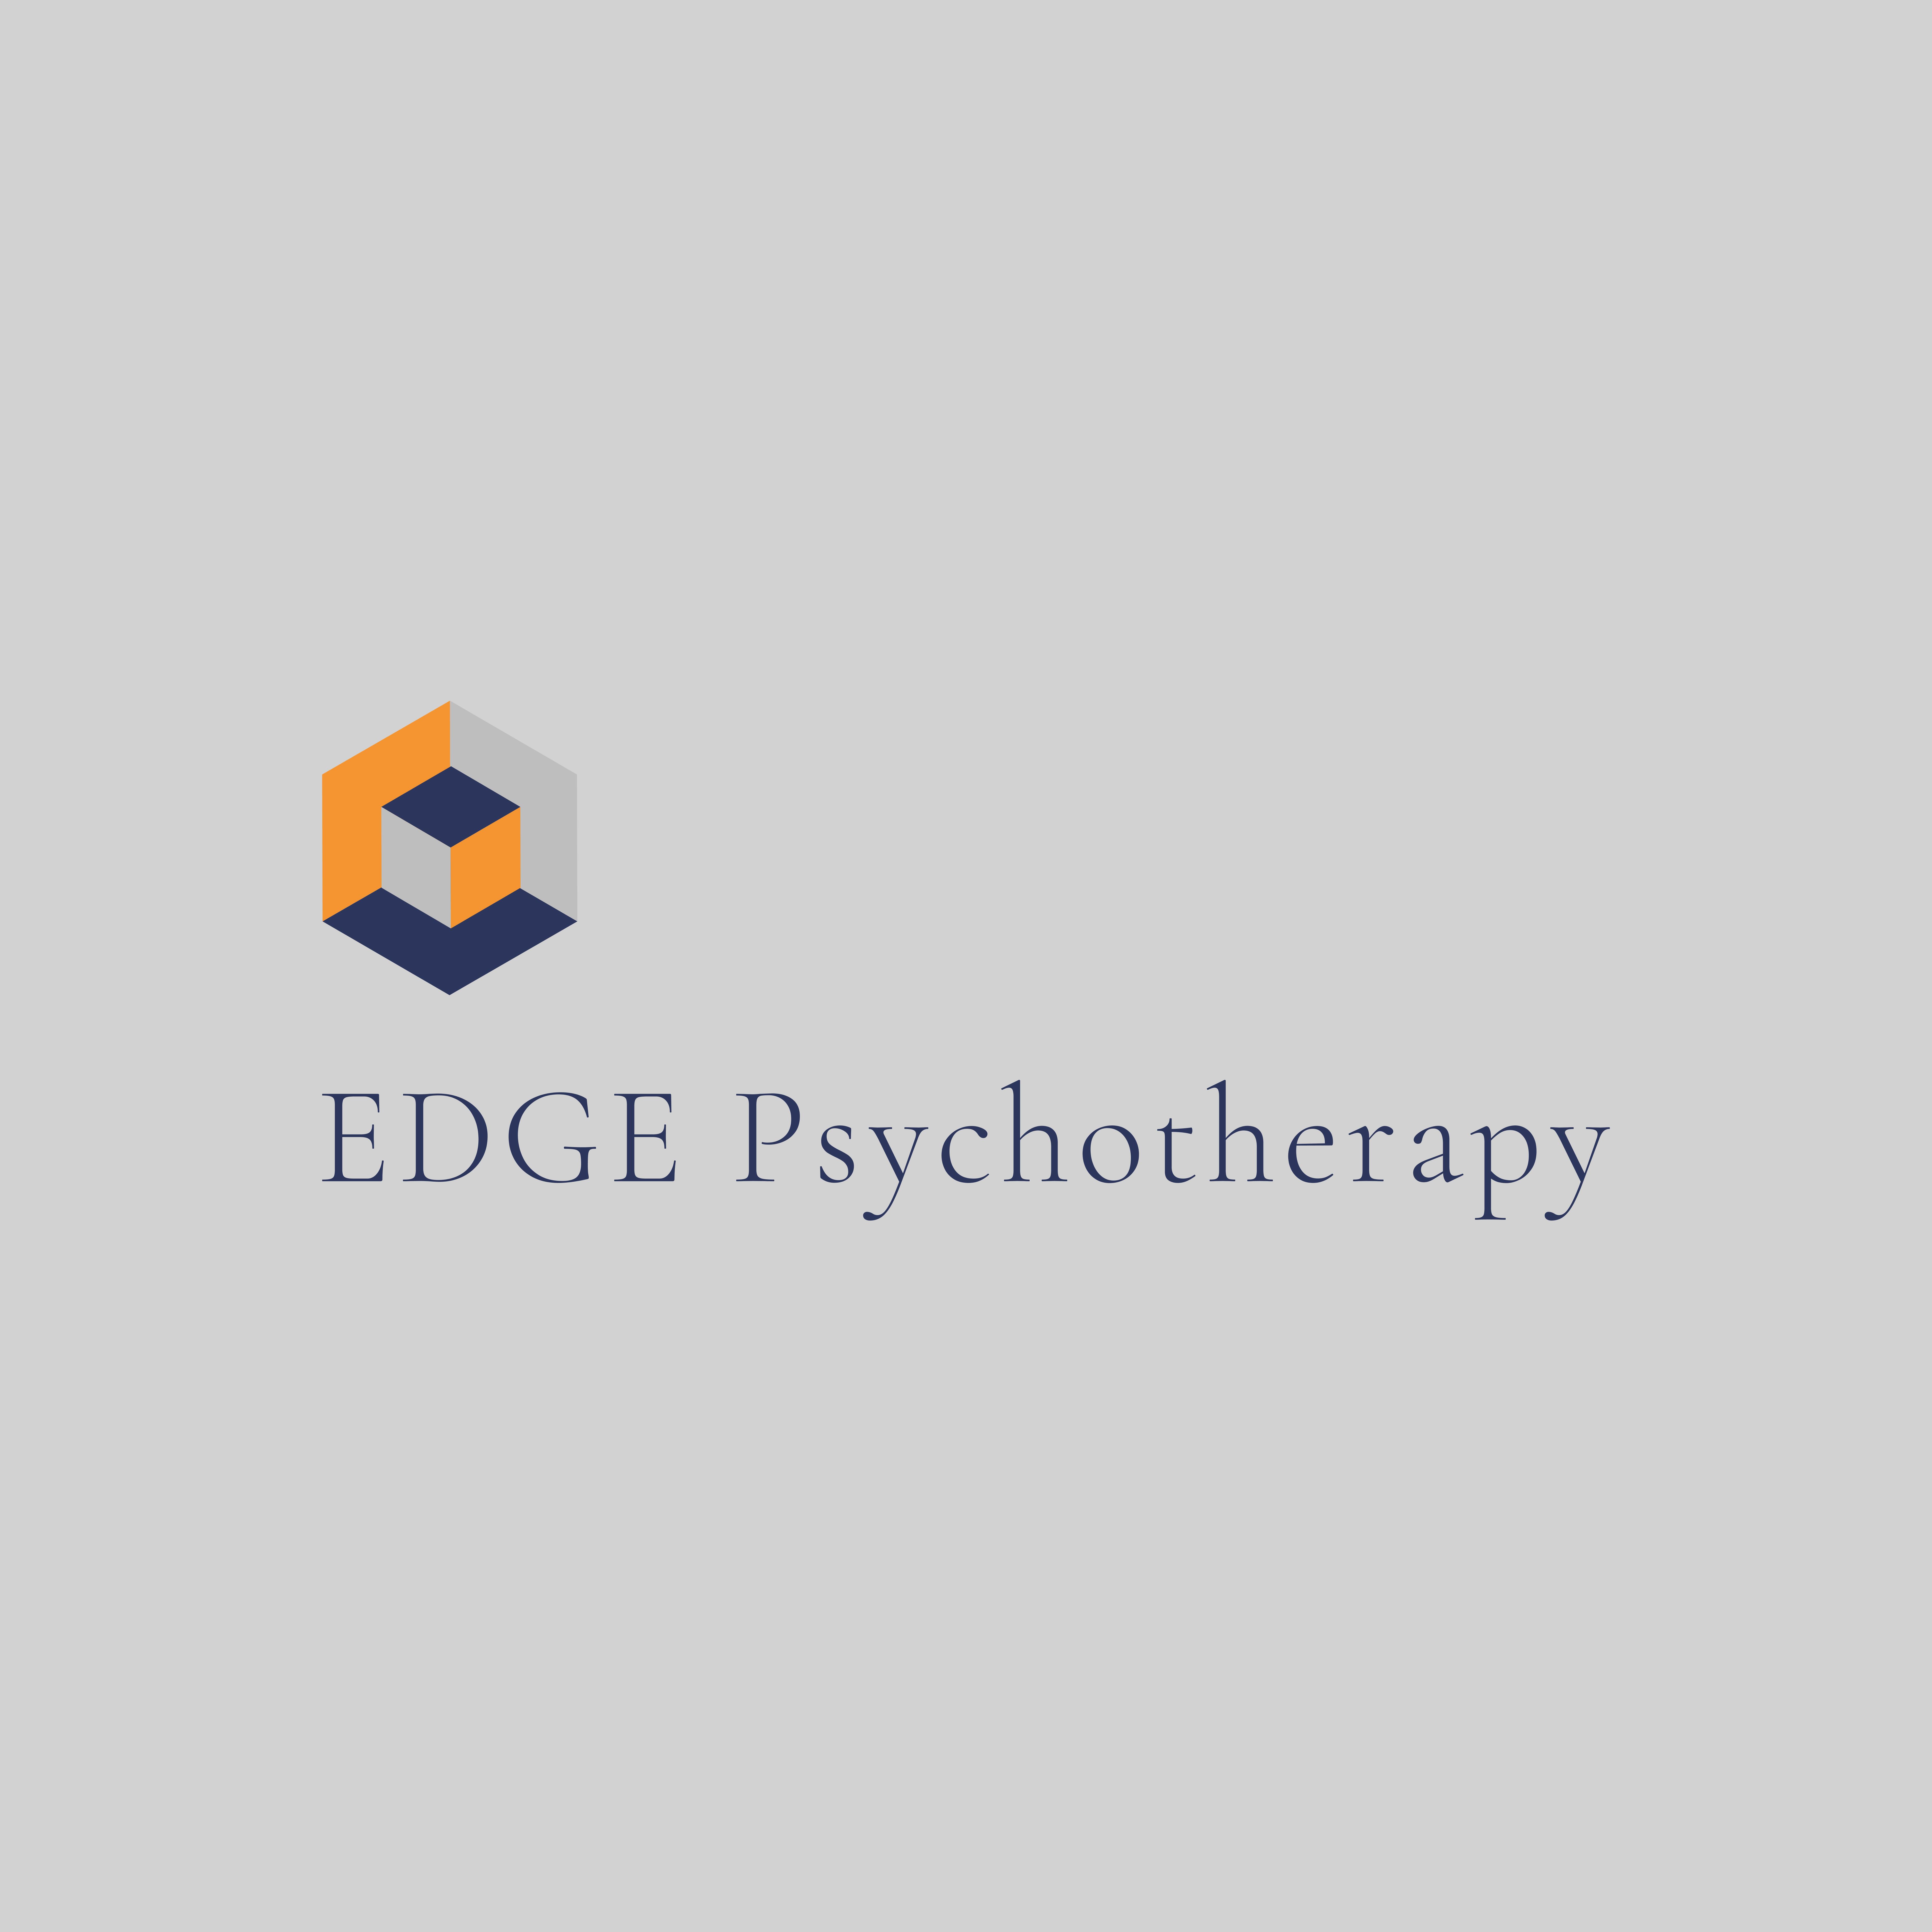 EDGE Psychotherapy